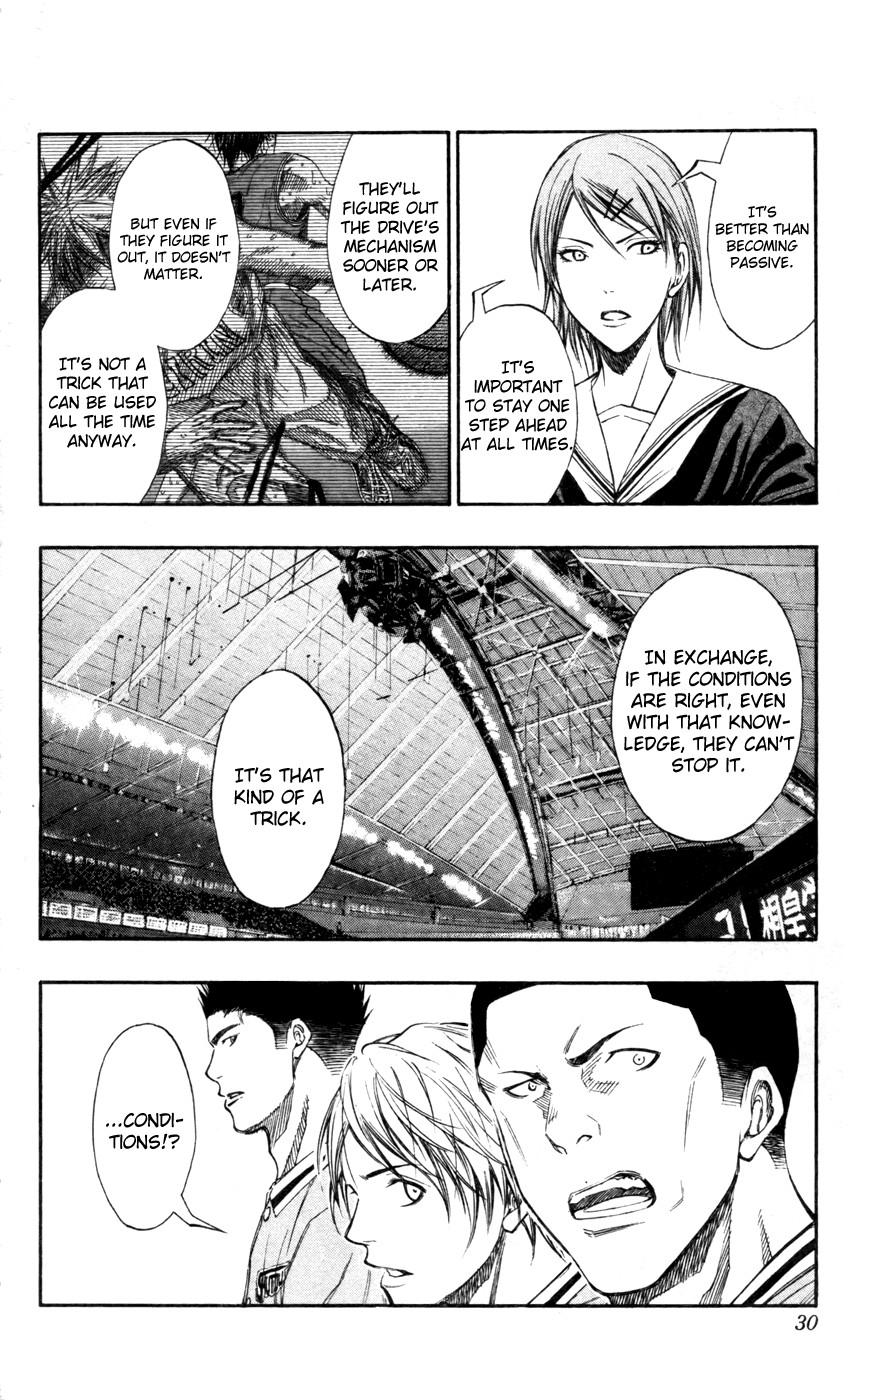 Kuroko no Basket Manga Chapter 119 - Image 4_030